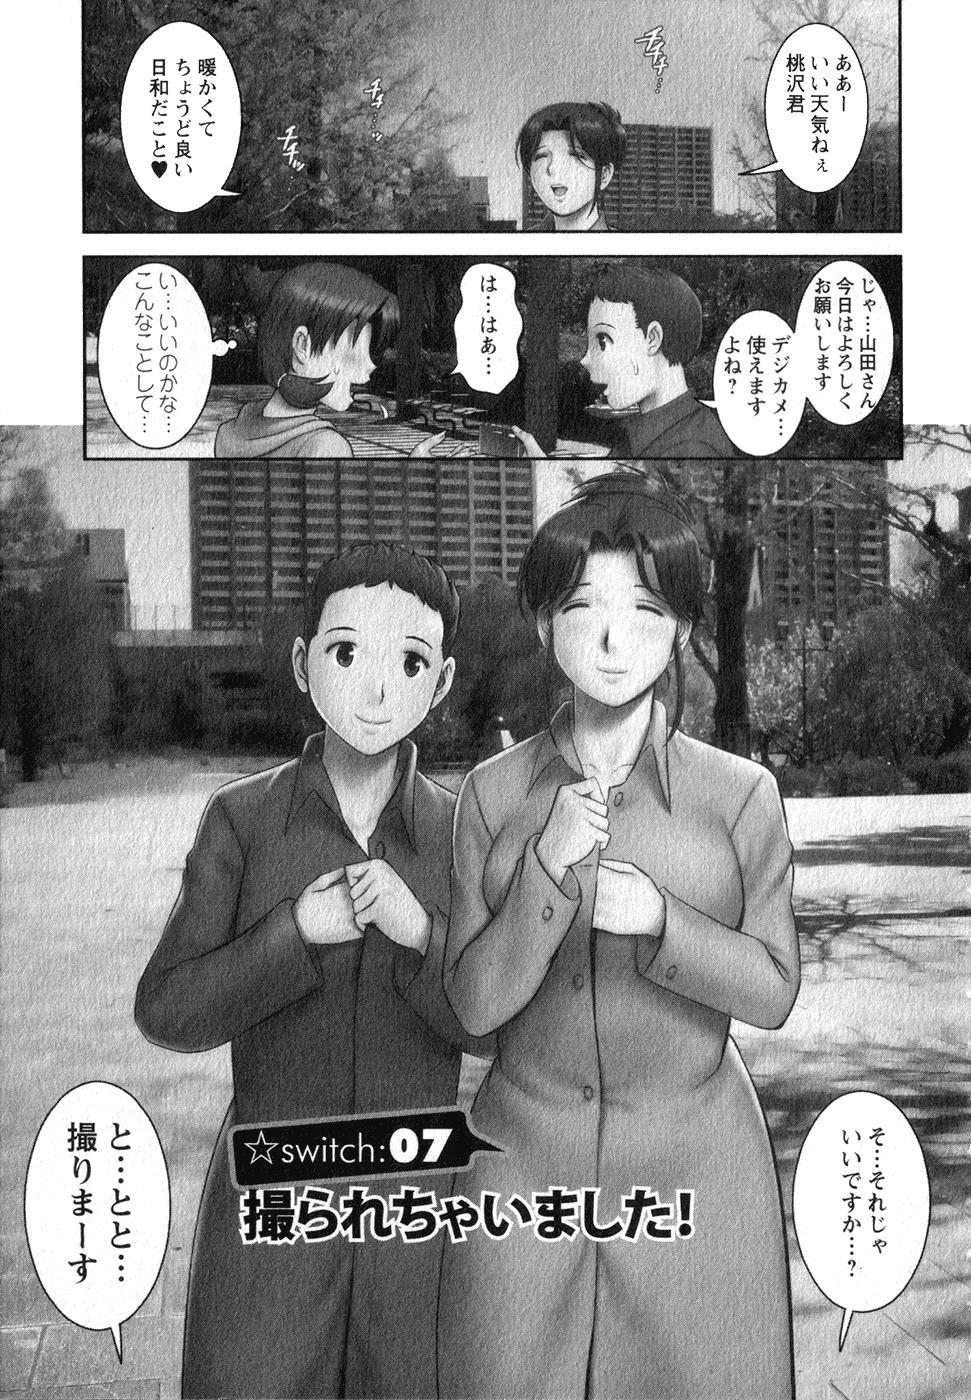 [Saigado] Kururi-san to Hirari-san Vol. 1 (Complete) 127